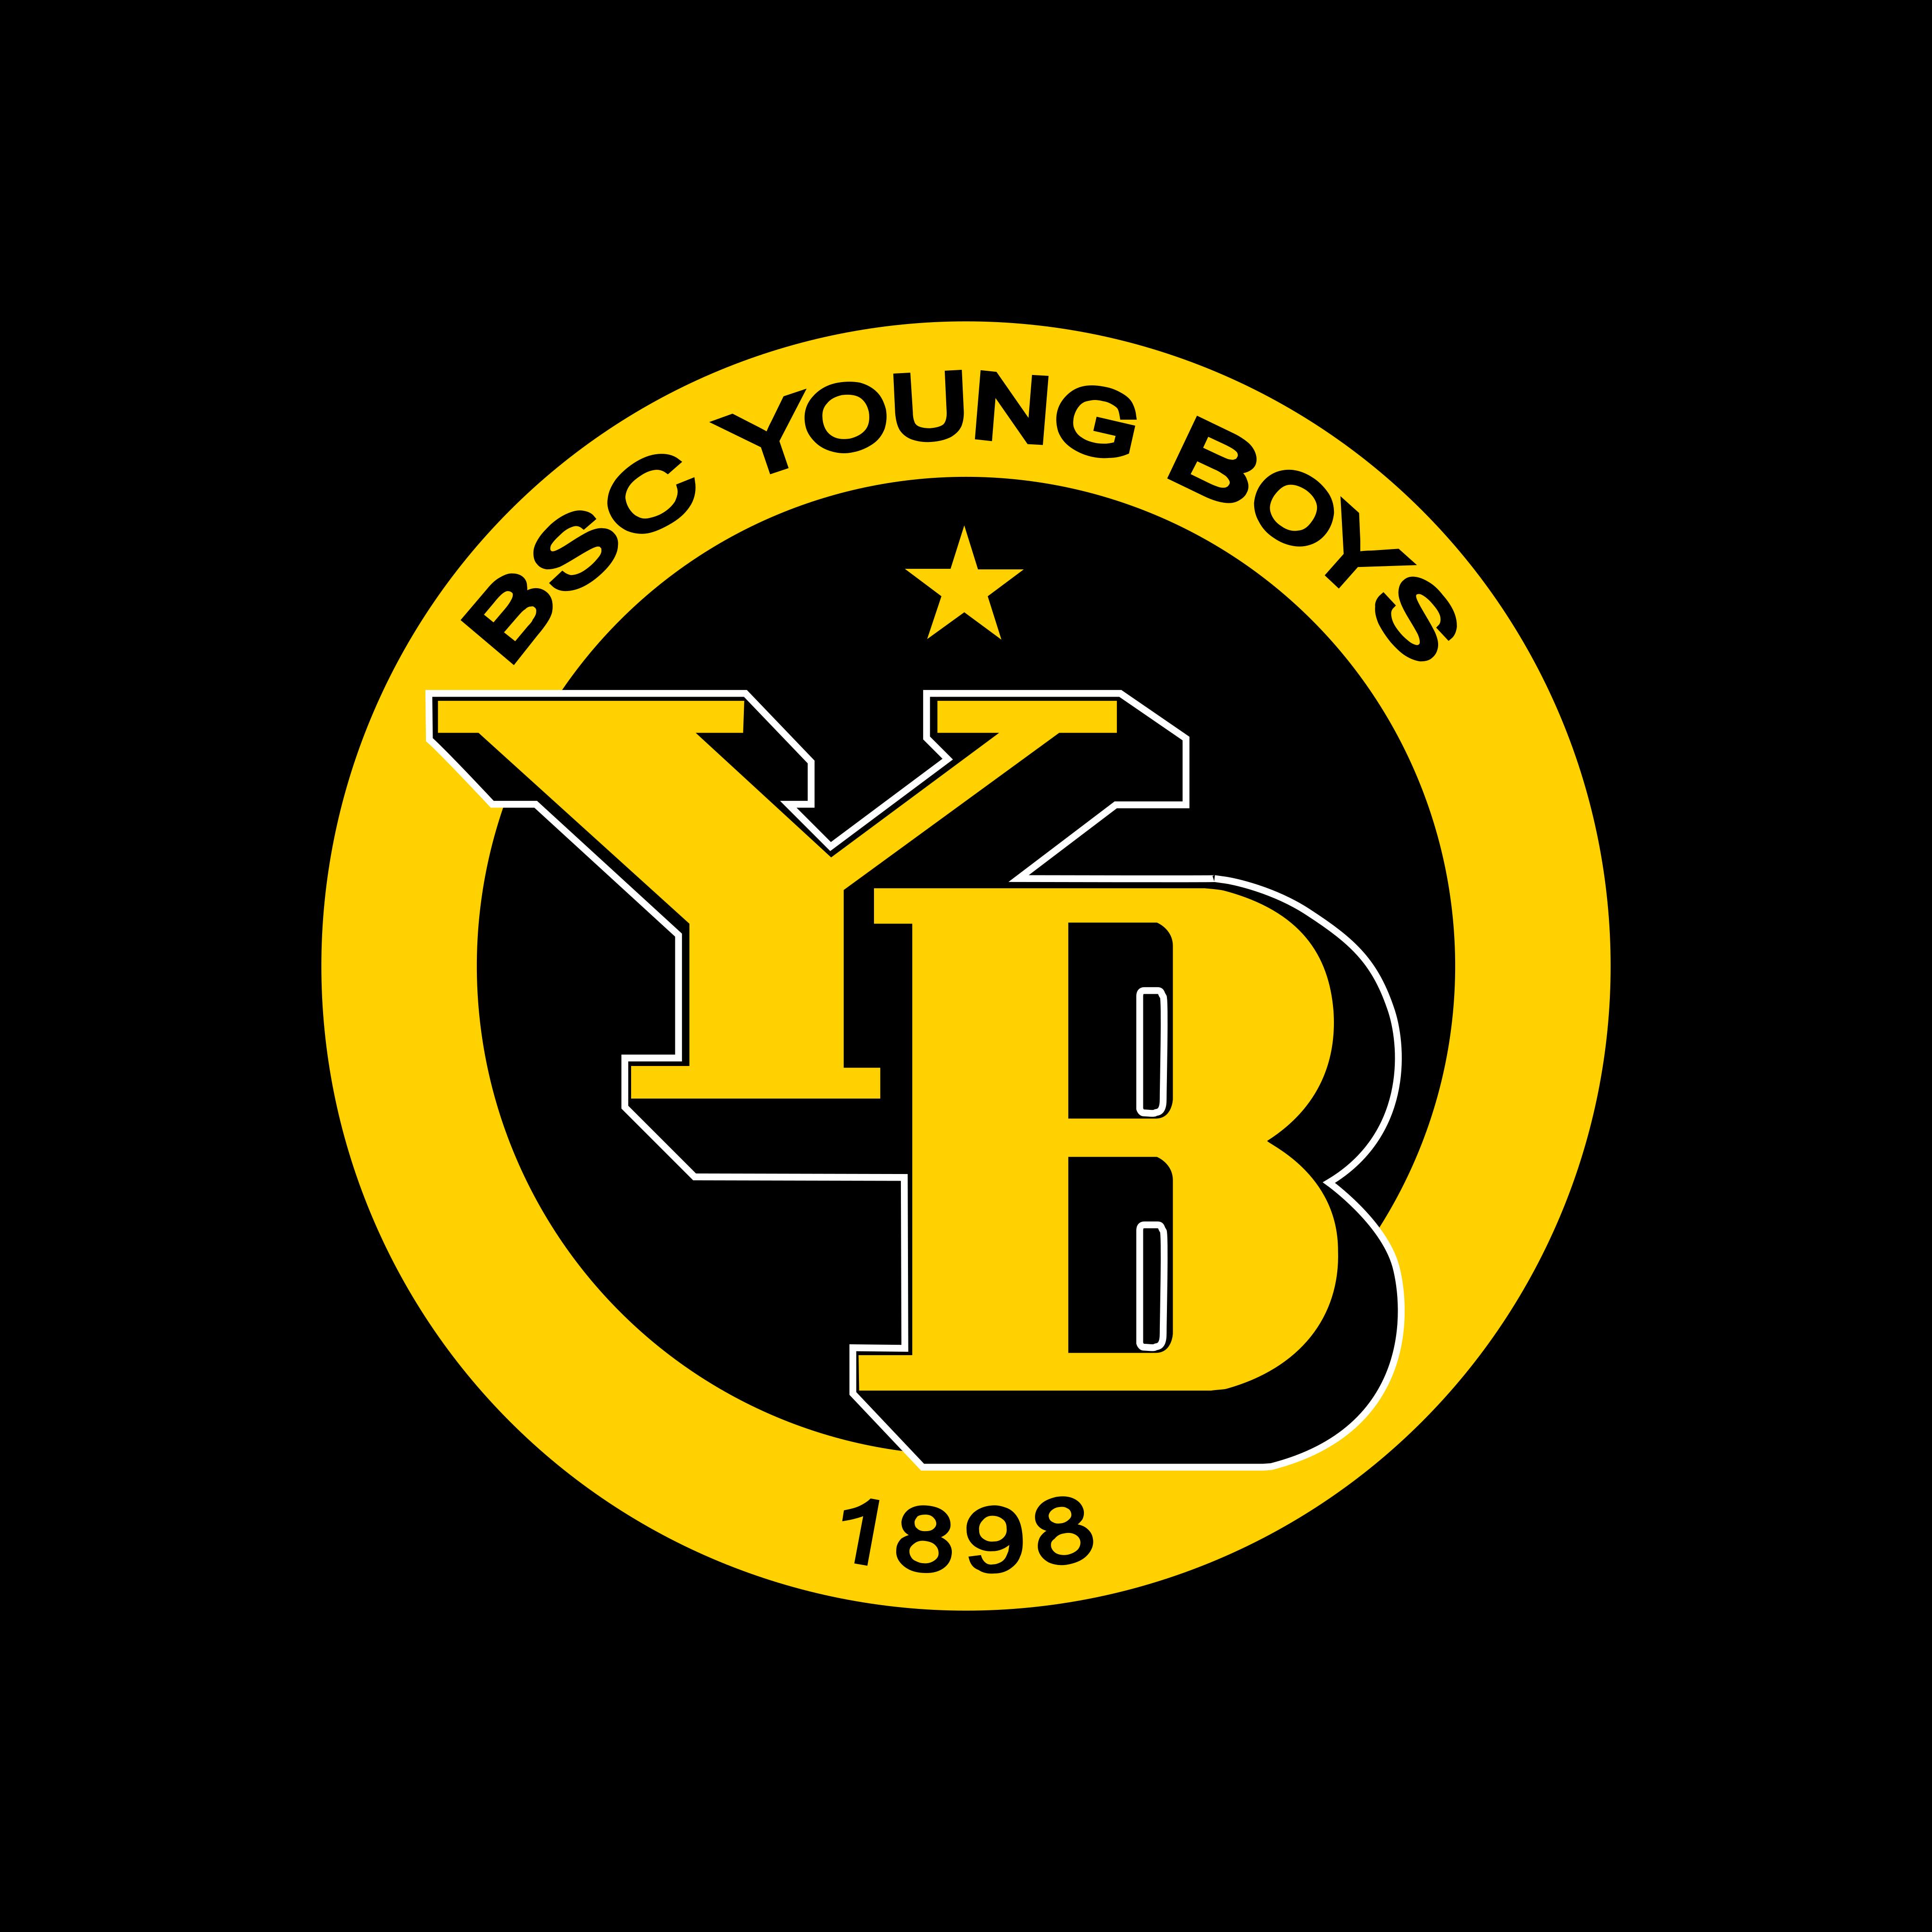 bsc young boys logo 0 - BSC Young Boys Logo